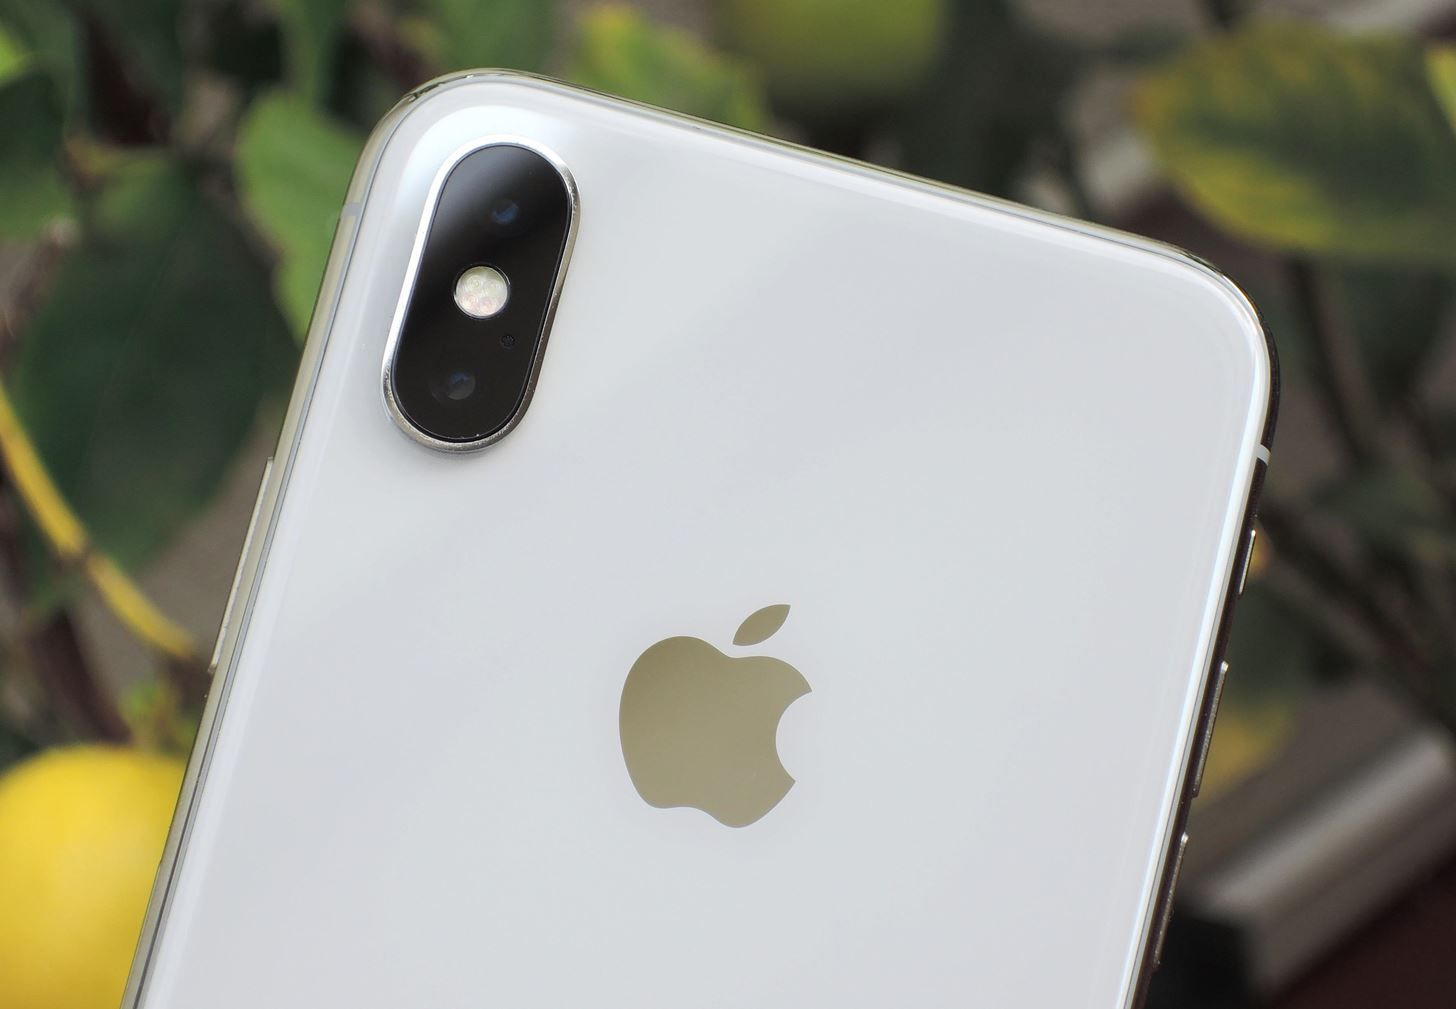 iPhone X销量不佳 苹果明年年初要降价?的照片